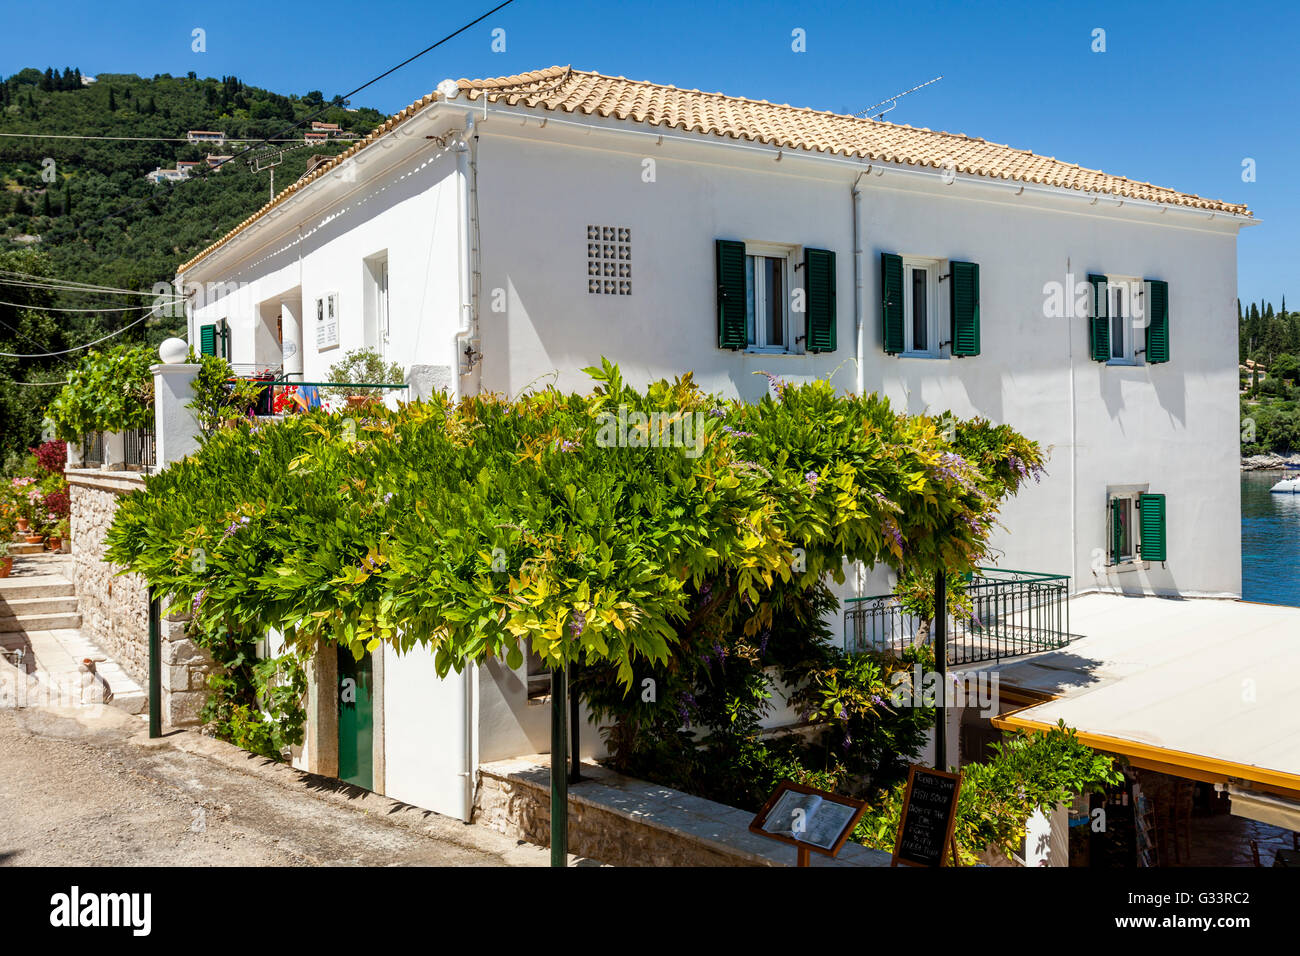 The White House ( Childhood Home of British Authors Gerald & Lawrence Durrell ) Kalami, Corfu Island, Greece. - Stock Image